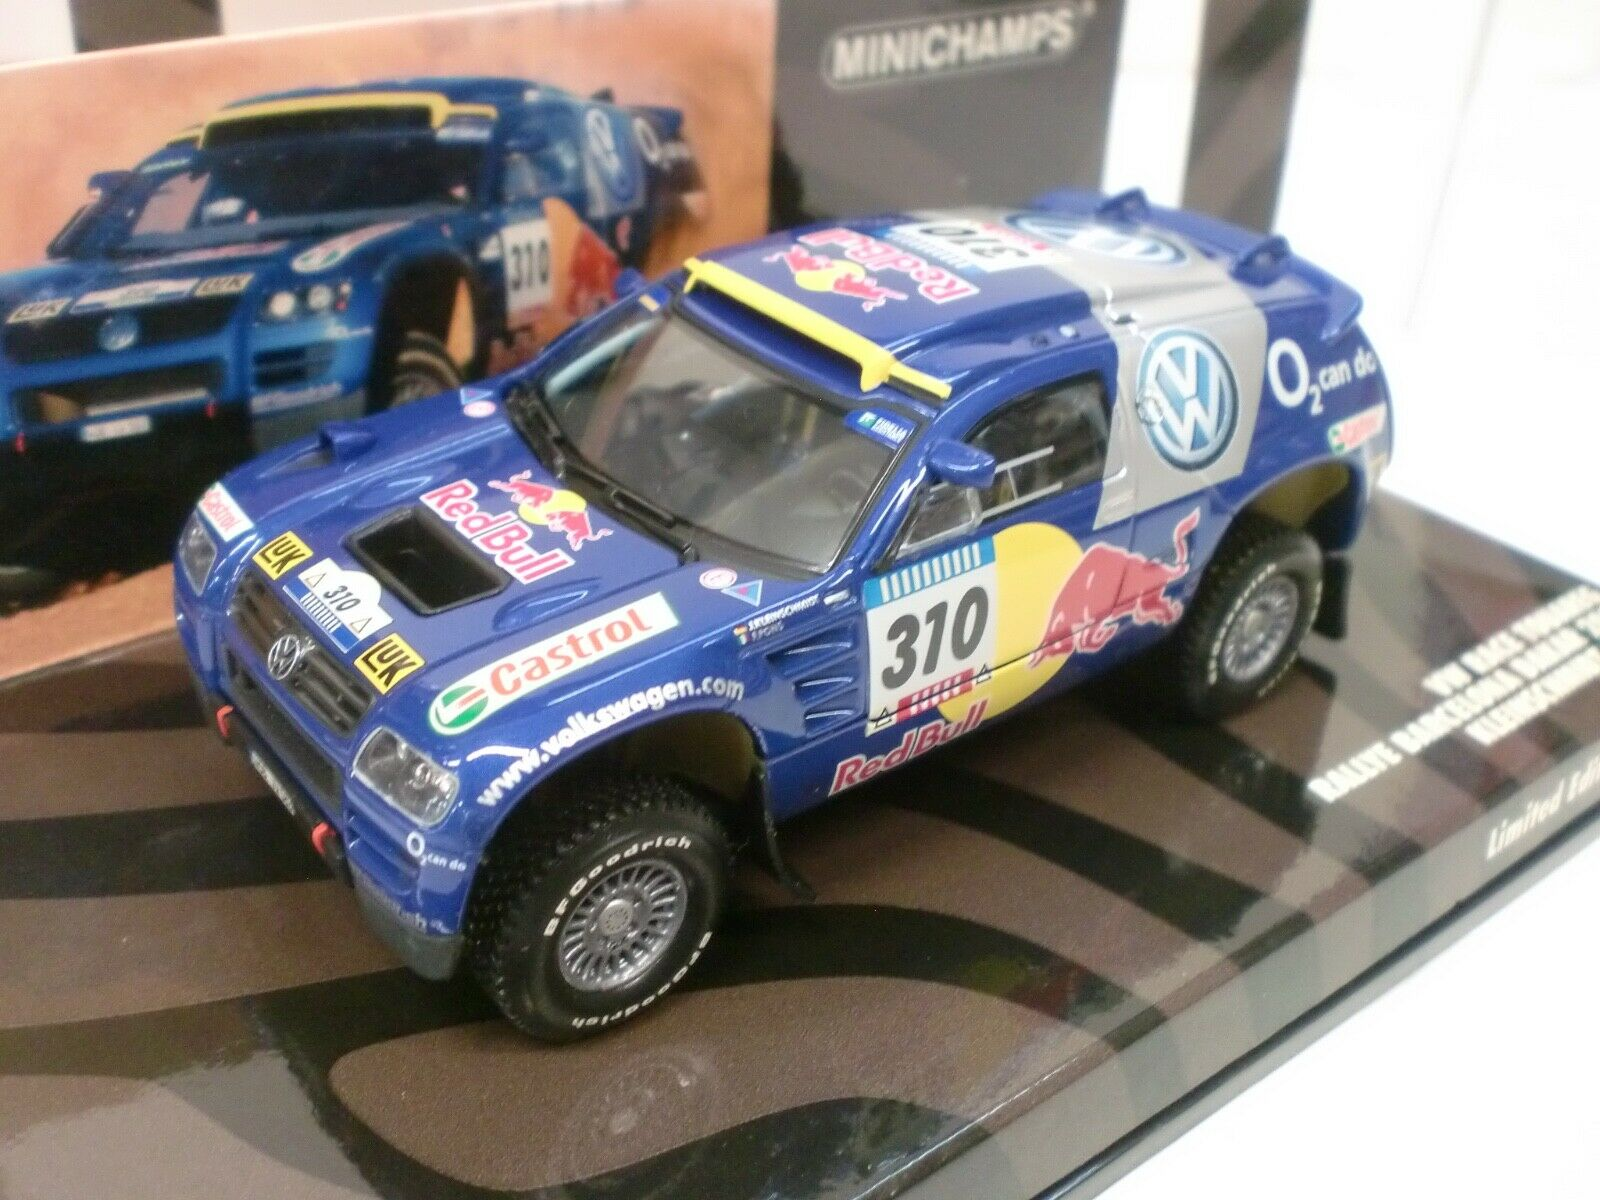 primera vez respuesta MINICHAMPS 1 43 - VW RACE TOUAREG RALLYE BARCELONA BARCELONA BARCELONA DAKAR 2005 - 436 055310  mejor oferta